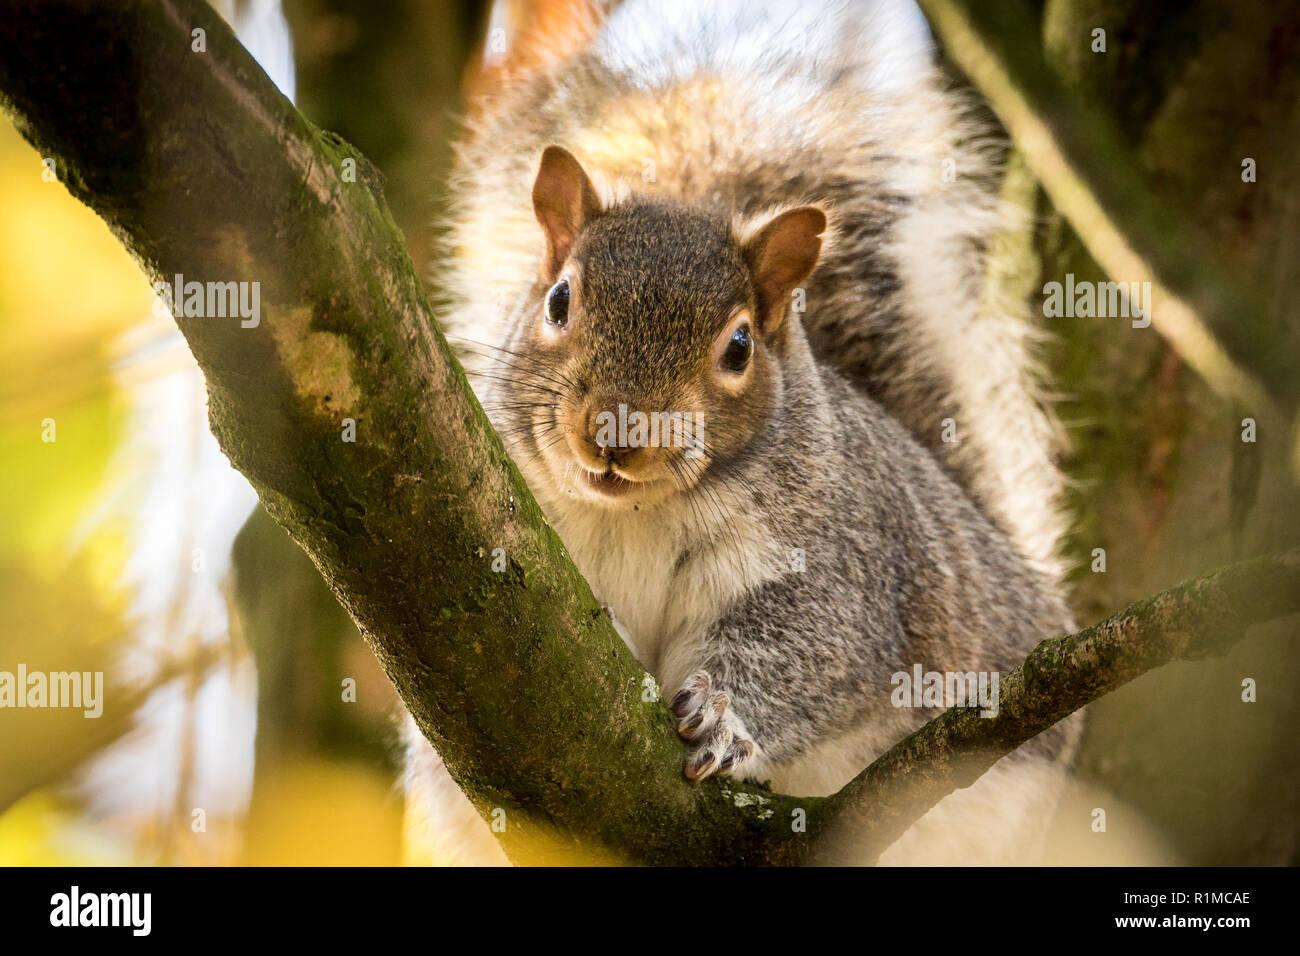 Grey squirrel in autumn sunshine. - Stock Image